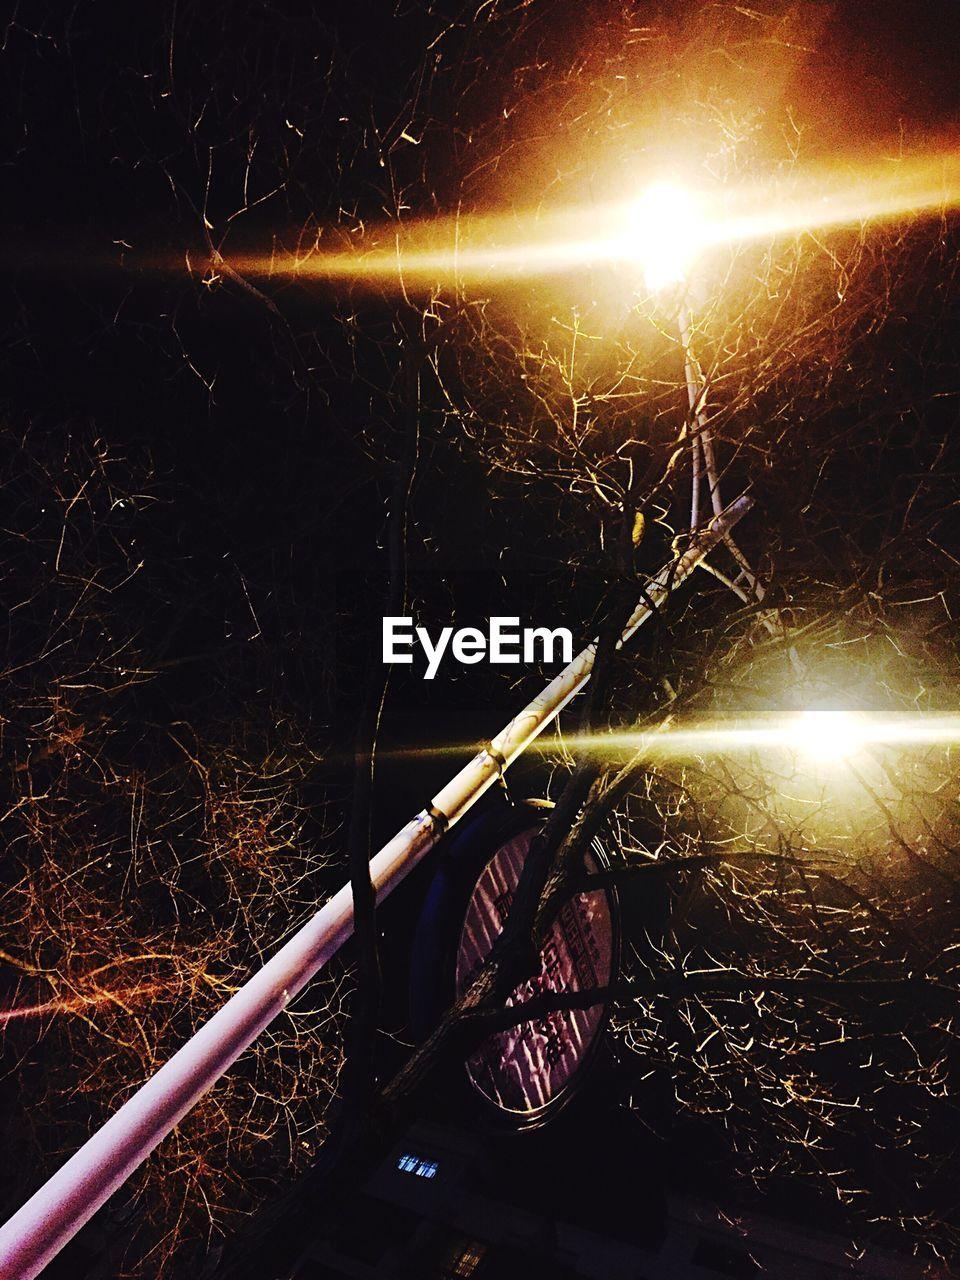 night, lens flare, illuminated, glowing, outdoors, no people, long exposure, light beam, nature, close-up